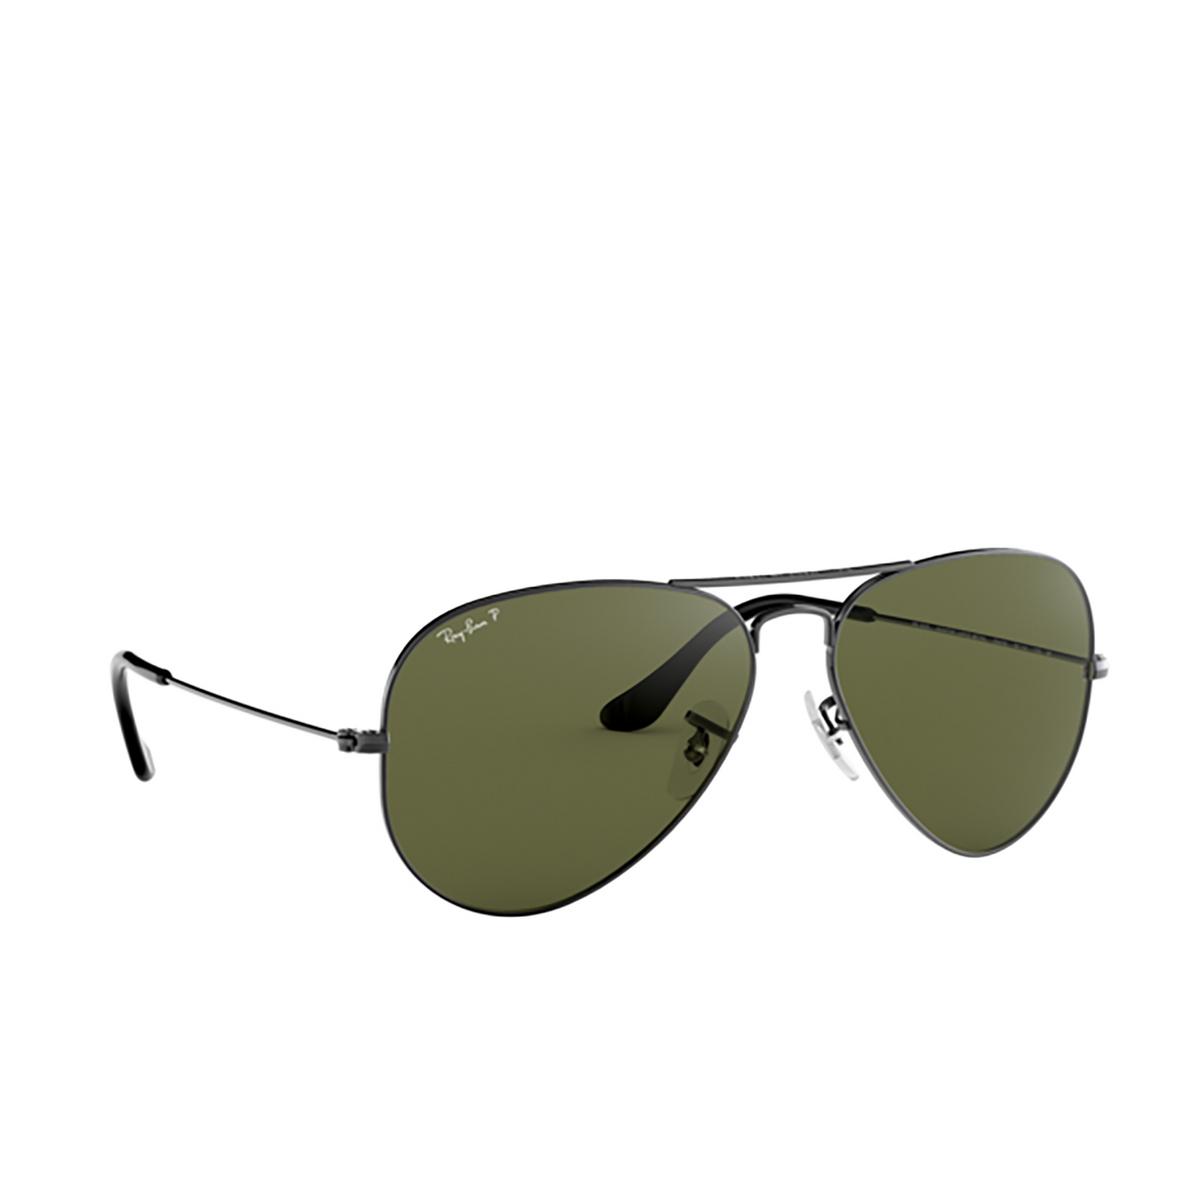 Ray-Ban® Aviator Sunglasses: Aviator Large Metal RB3025 color Gunmetal 004/58 - three-quarters view.